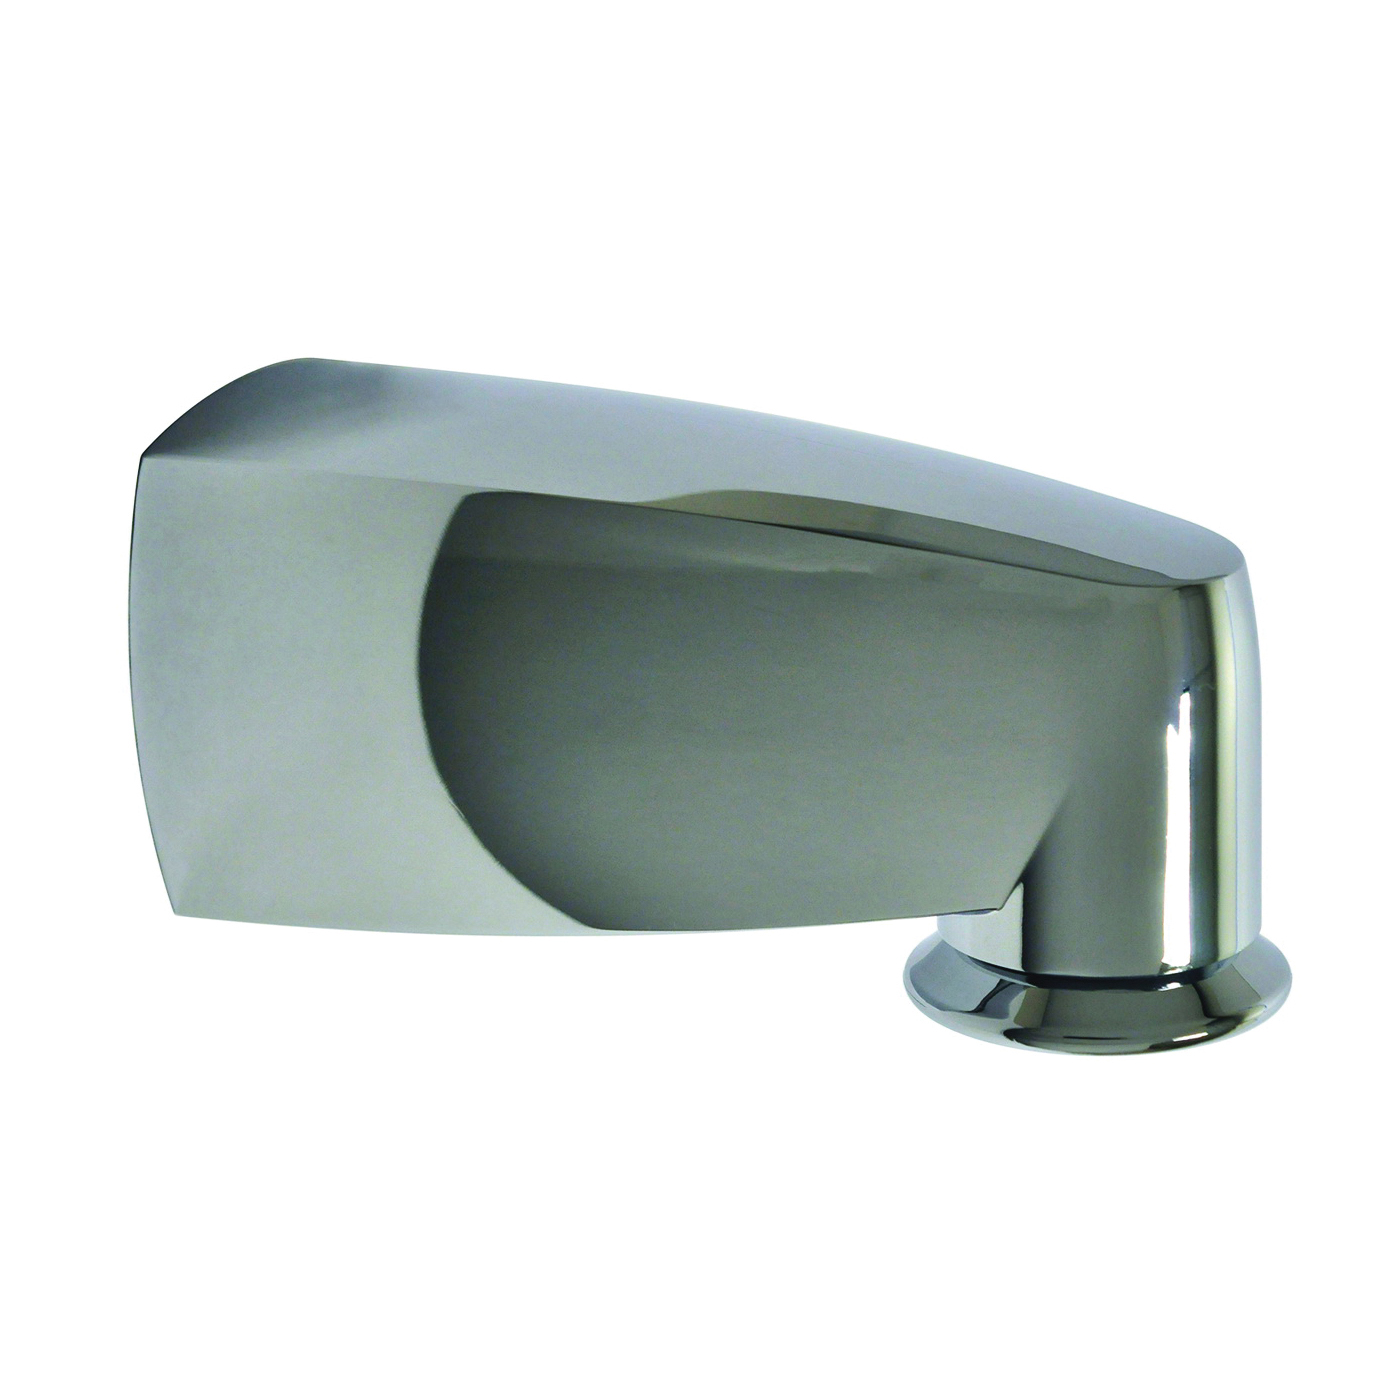 Picture of Danco 10766 Tub Spout, 6 in L, Metal, Chrome